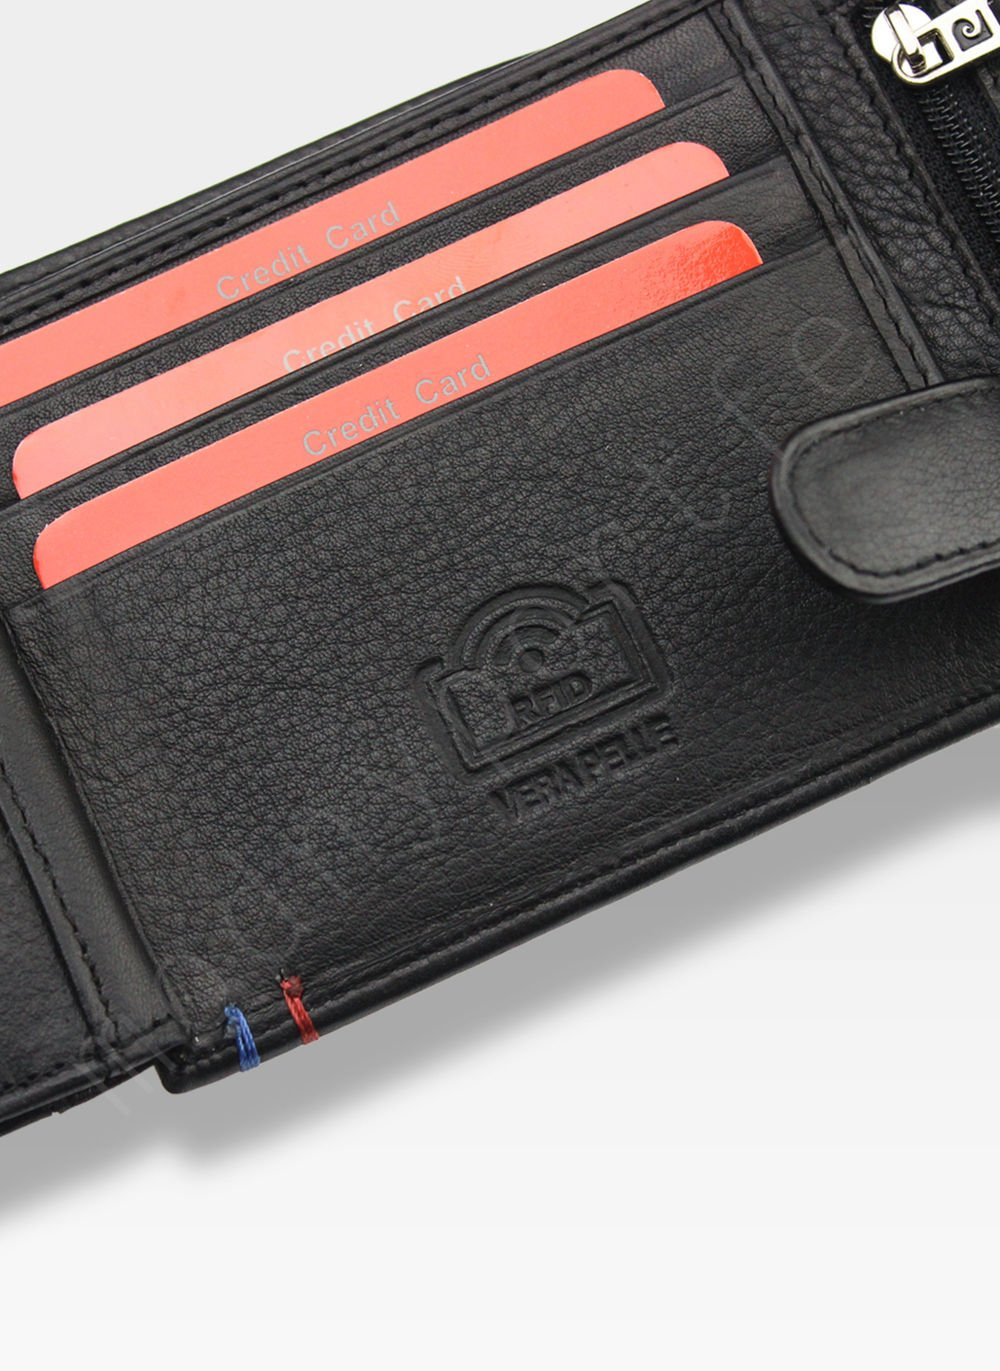 e6638c2ba72d3 Dobry portfel męski Gentleman Pierre Cardin Tilak26 324A RFID ...